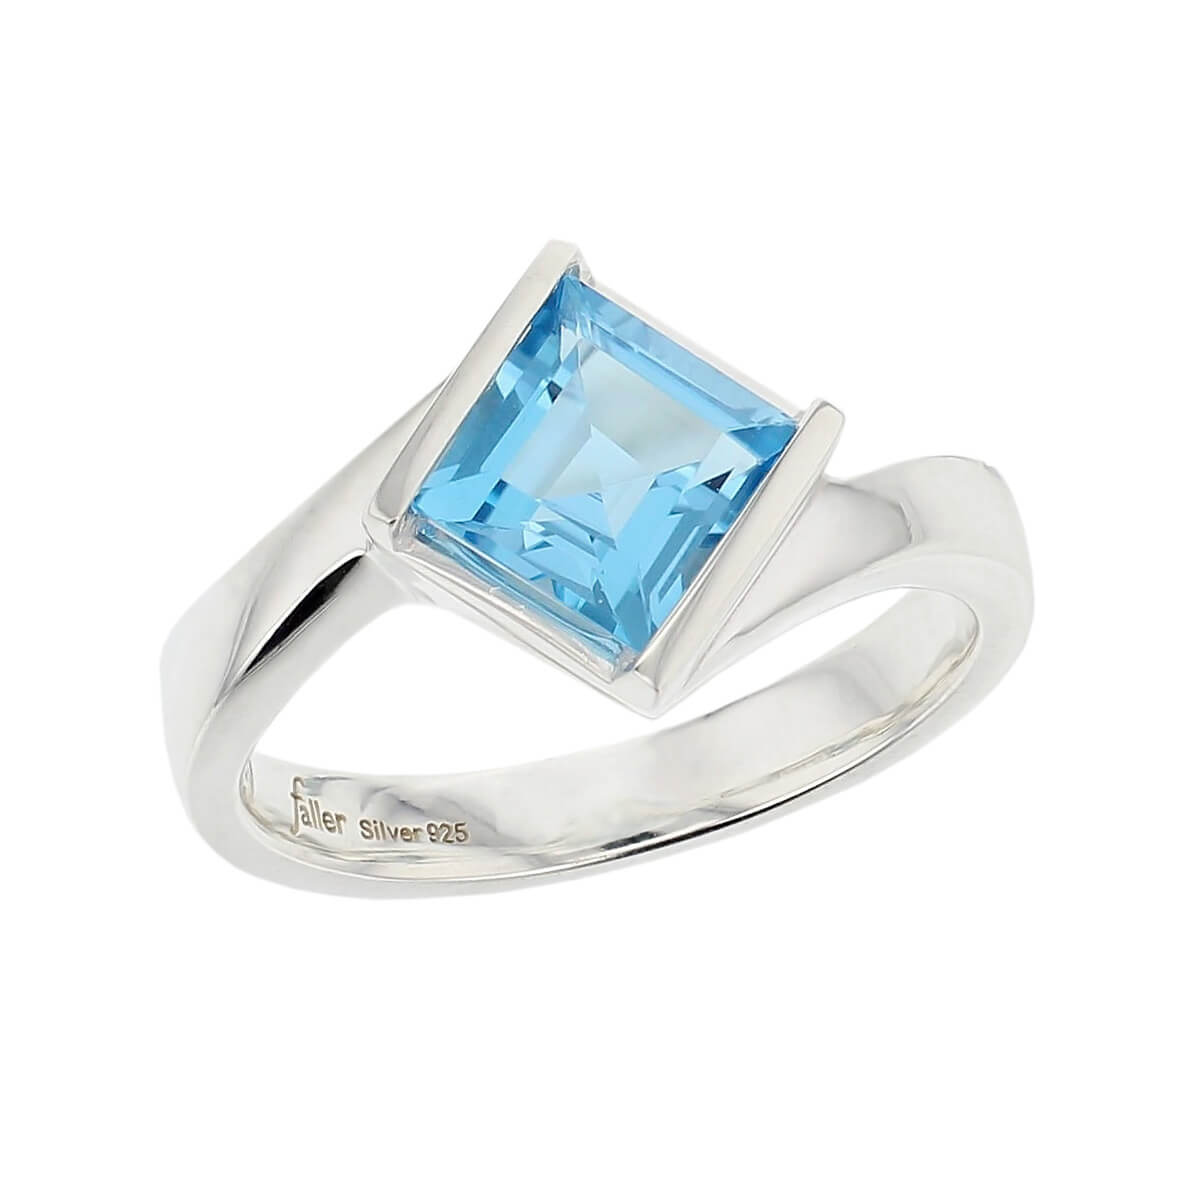 sterling silver blue square cut topaz gemstone dress ring, designer jewellery, gem, jewelry, handmade by Faller, Londonderry, Northern Ireland, Irish hand crafted, darcy, D'arcy